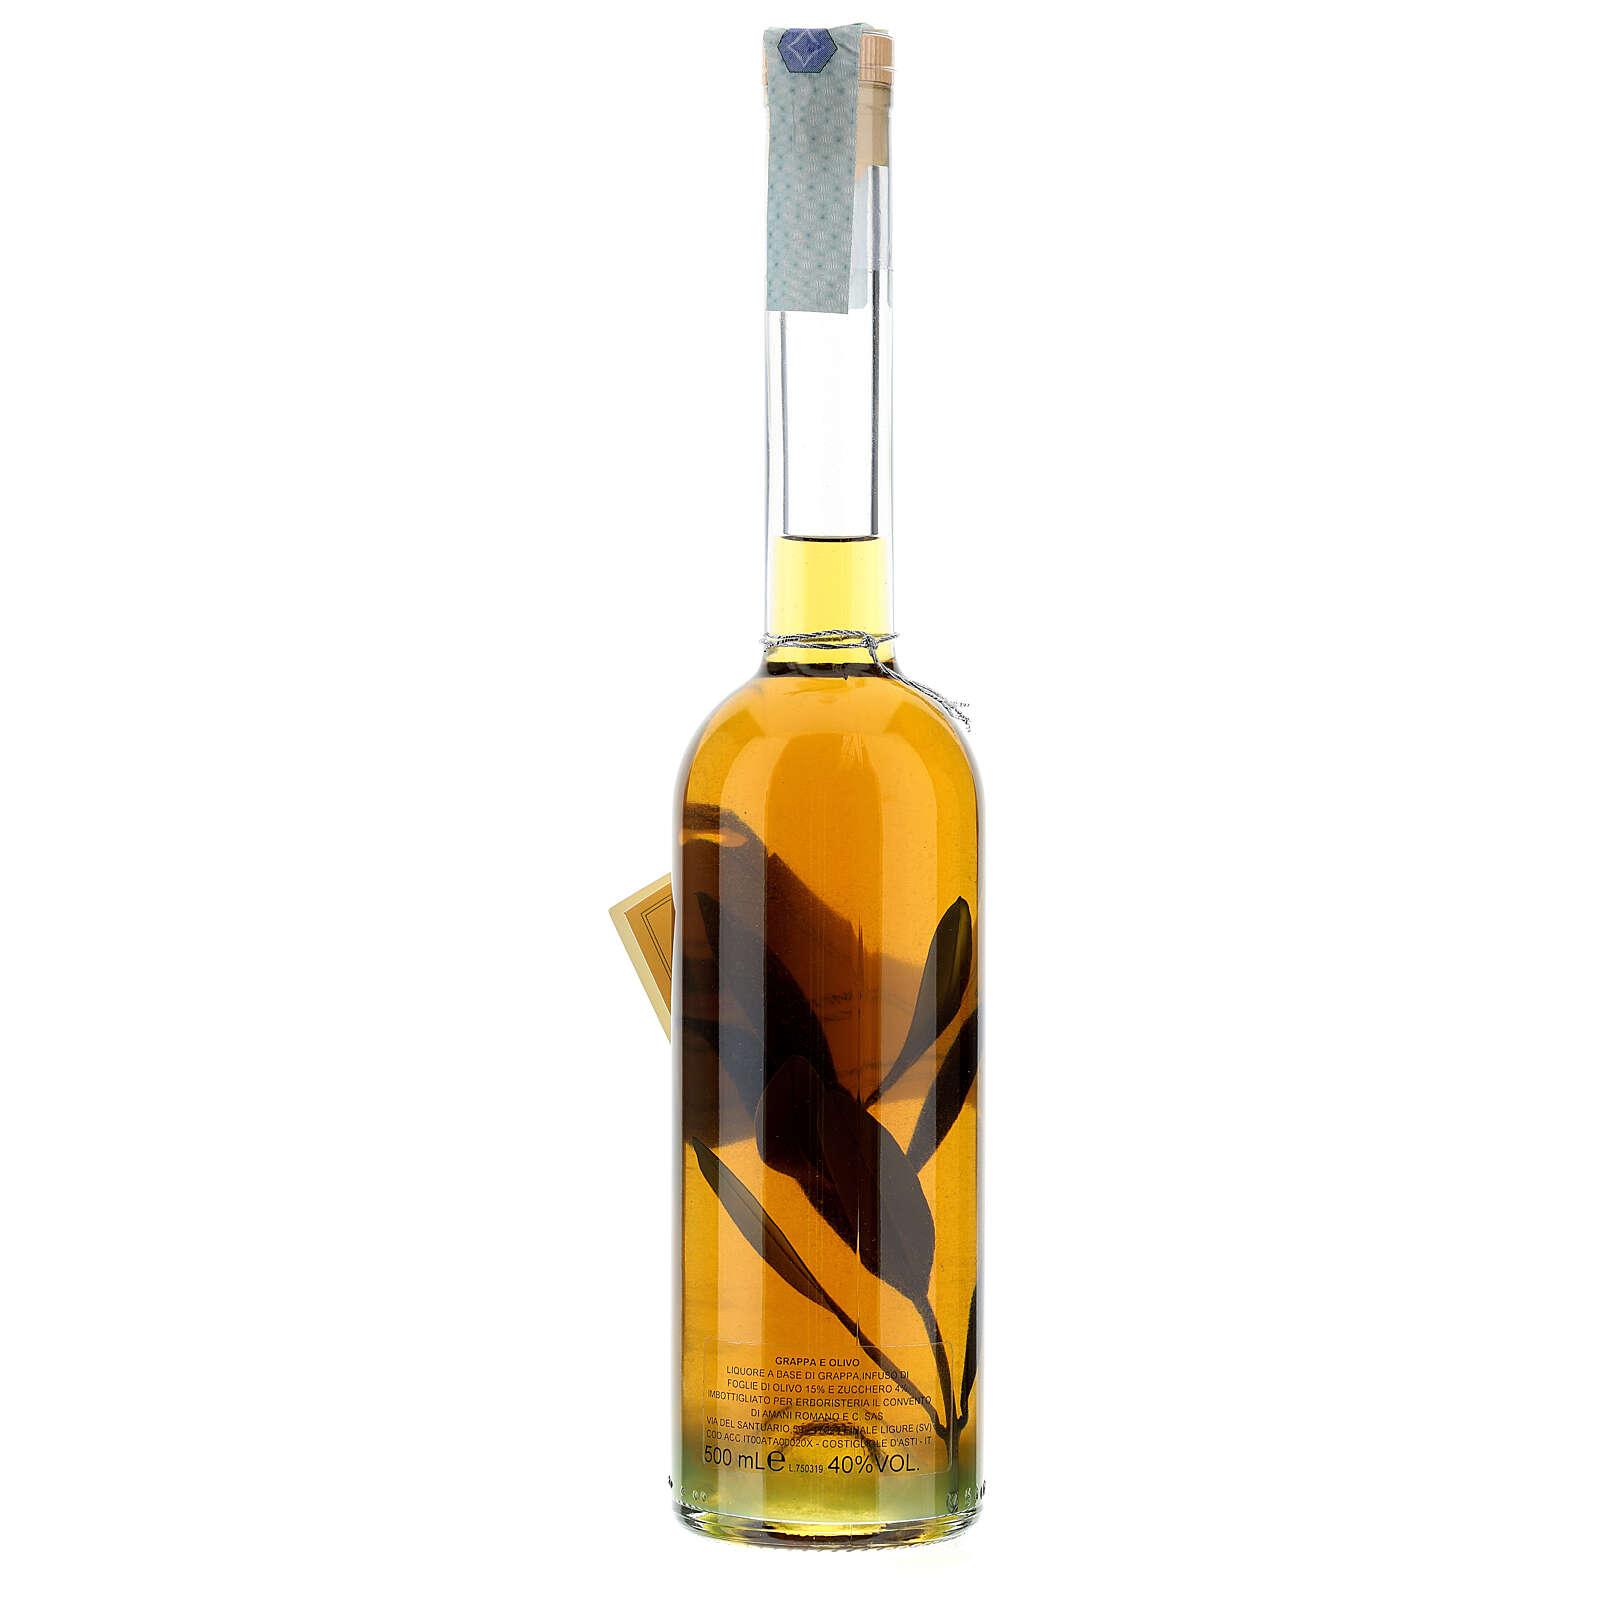 Grappa all'olivo 500 ml 3